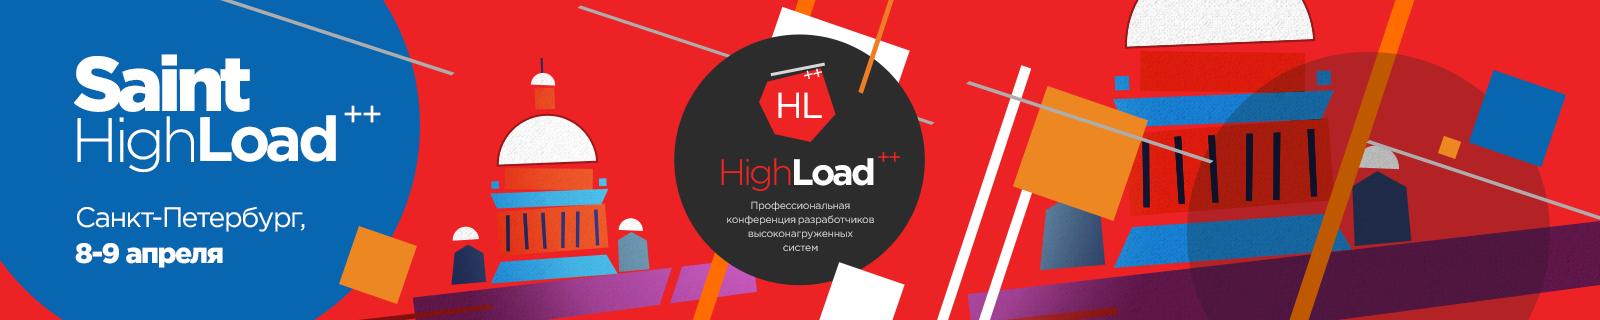 Sain HighLoad++ 8-9 апреля